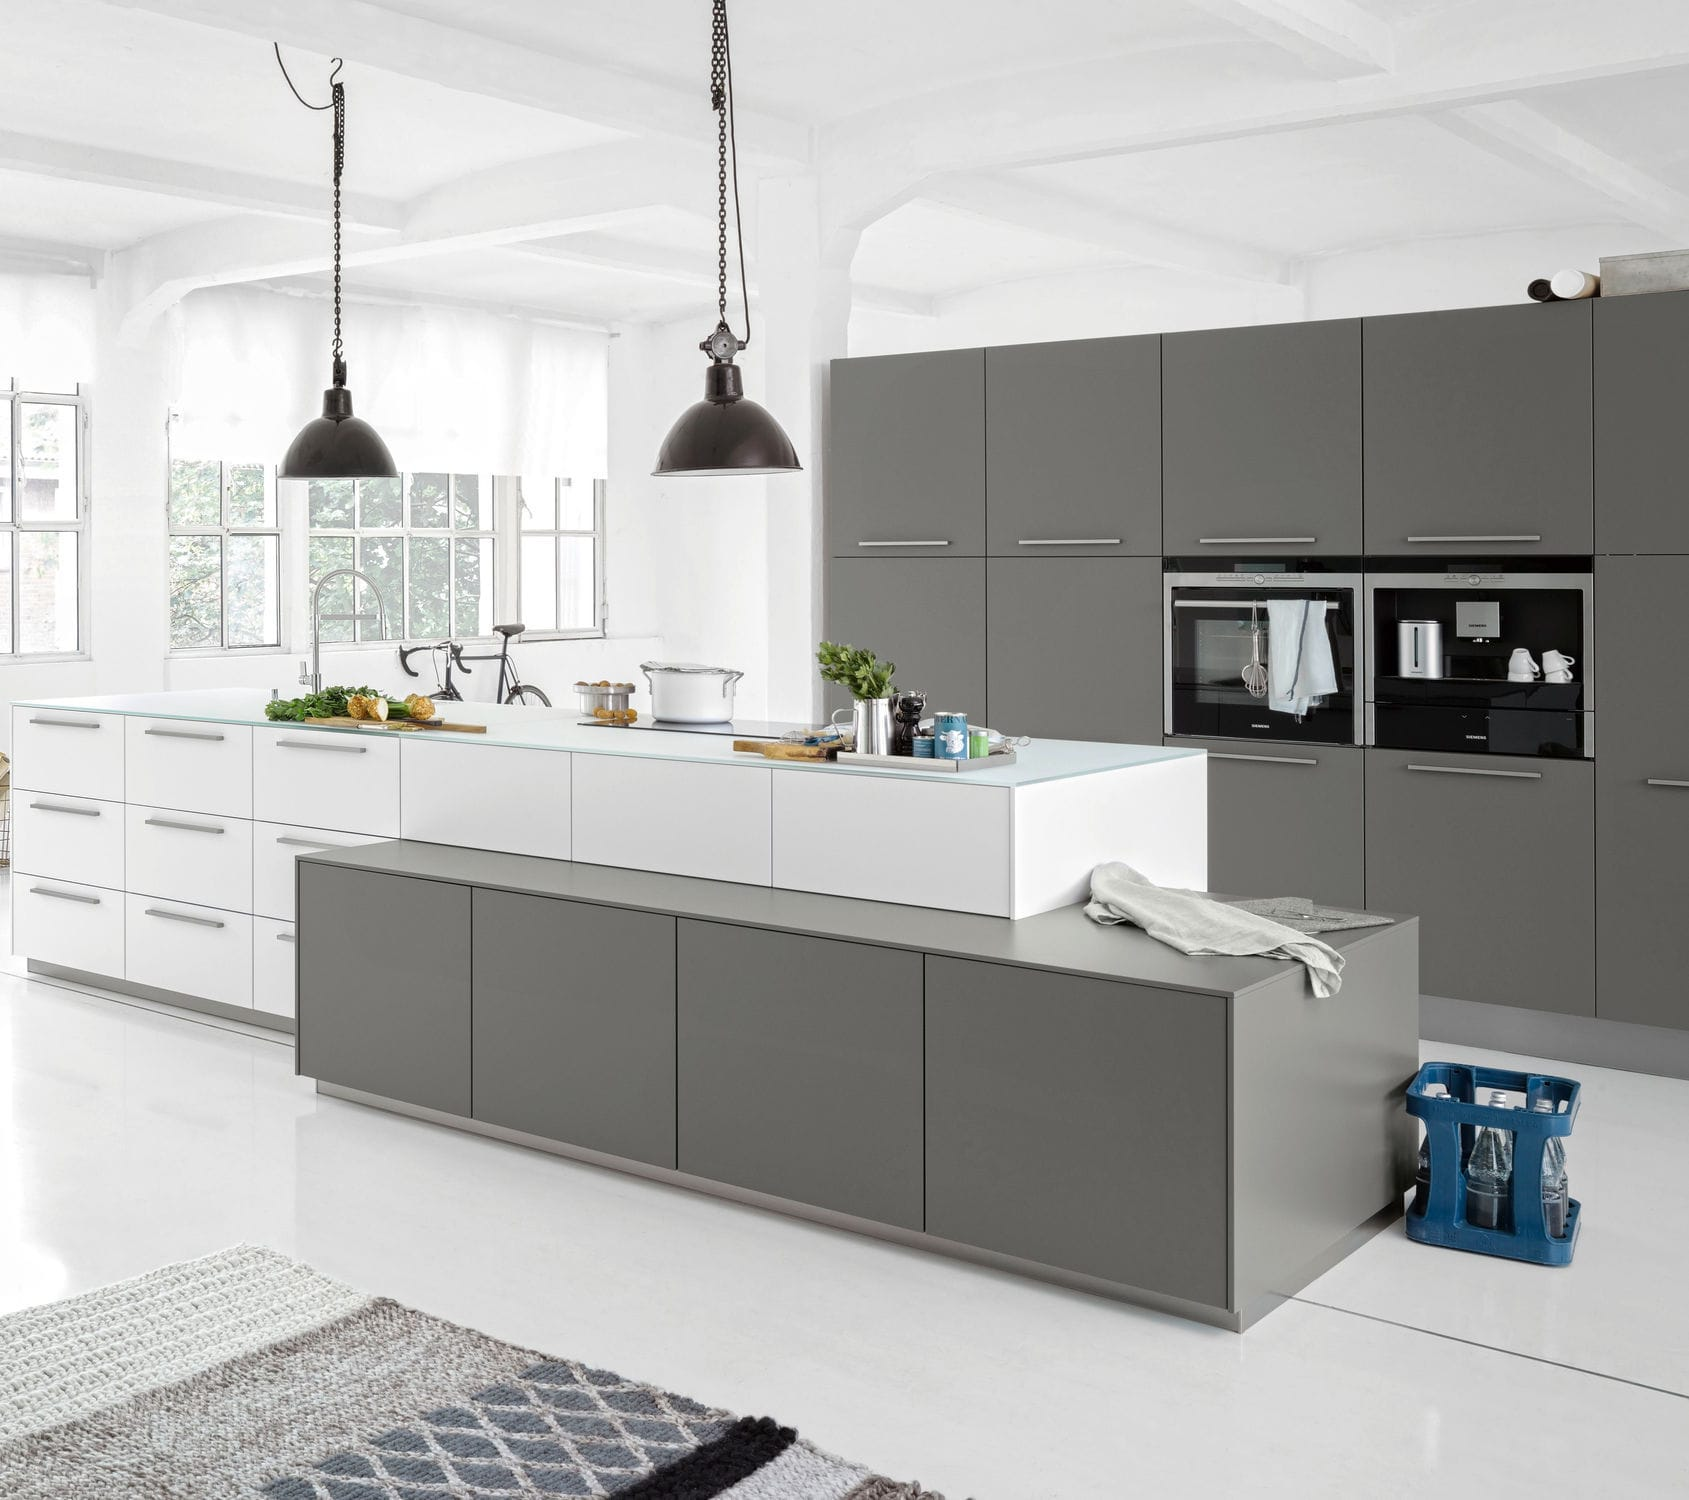 Contemporary Kitchen / Lacquered Wood / Glass / Island   SOFT LACK  ARCTIC/QUARZ